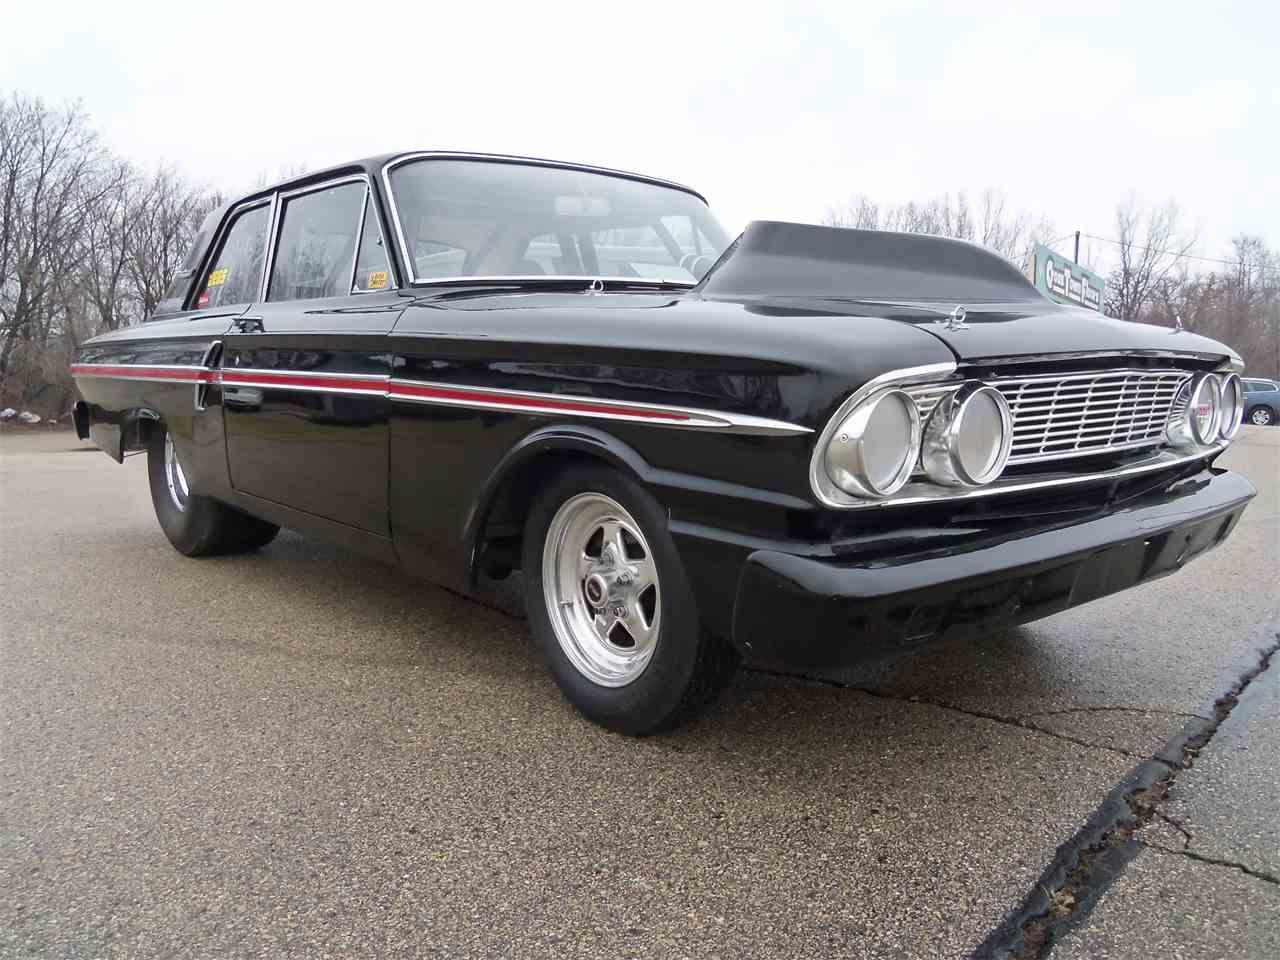 1964 Ford Fairlane Tudor Drag Car for Sale | ClassicCars.com | CC-945900